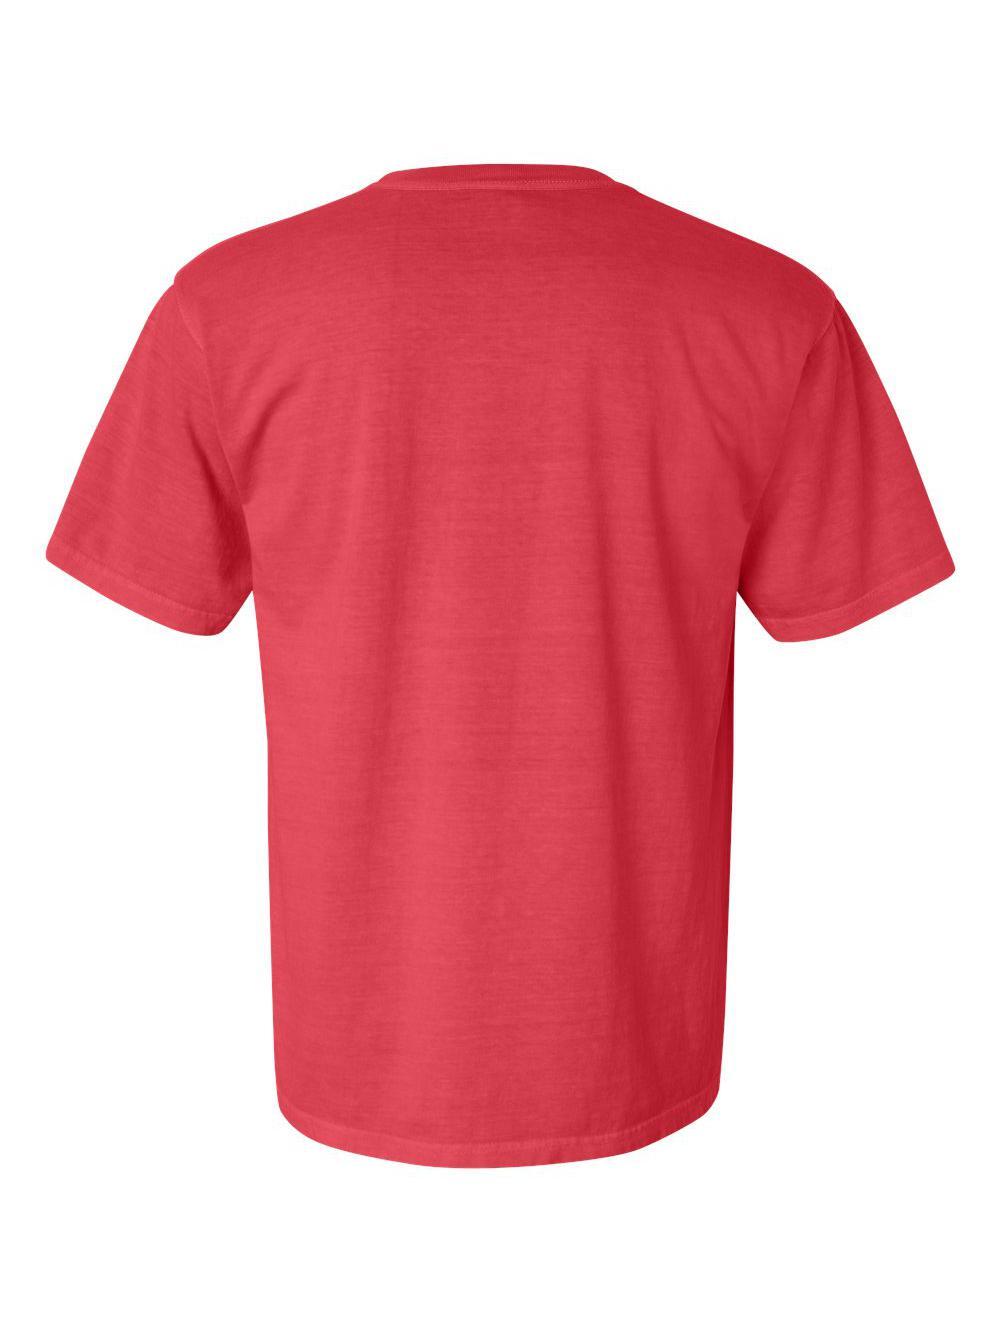 Comfort-Colors-Garment-Dyed-Heavyweight-Ringspun-Short-Sleeve-Shirt-1717 thumbnail 127